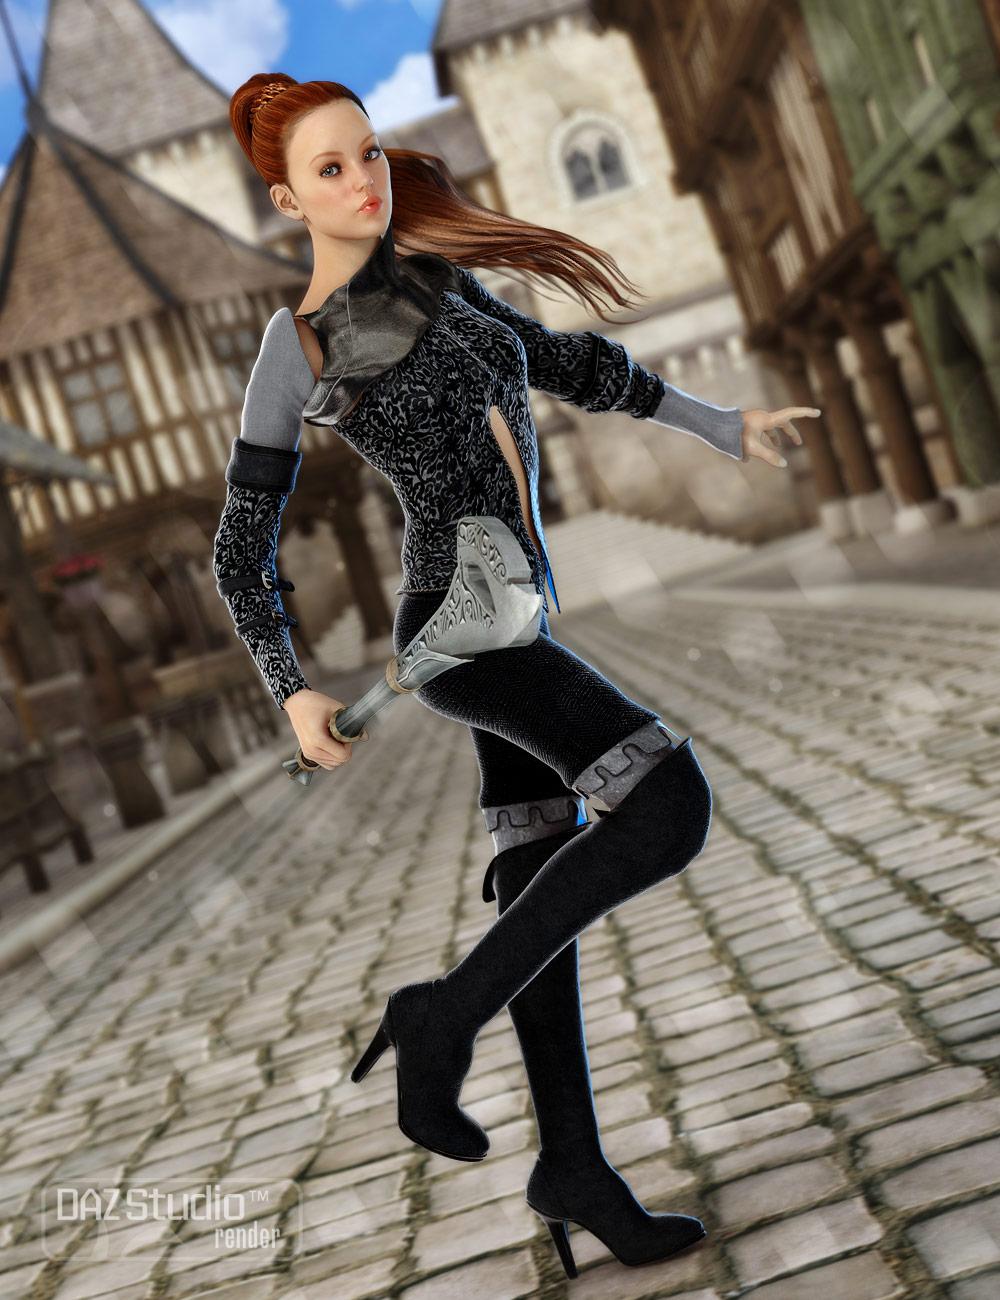 Scarlet for Genesis by: Barbara BrundonSarsa, 3D Models by Daz 3D